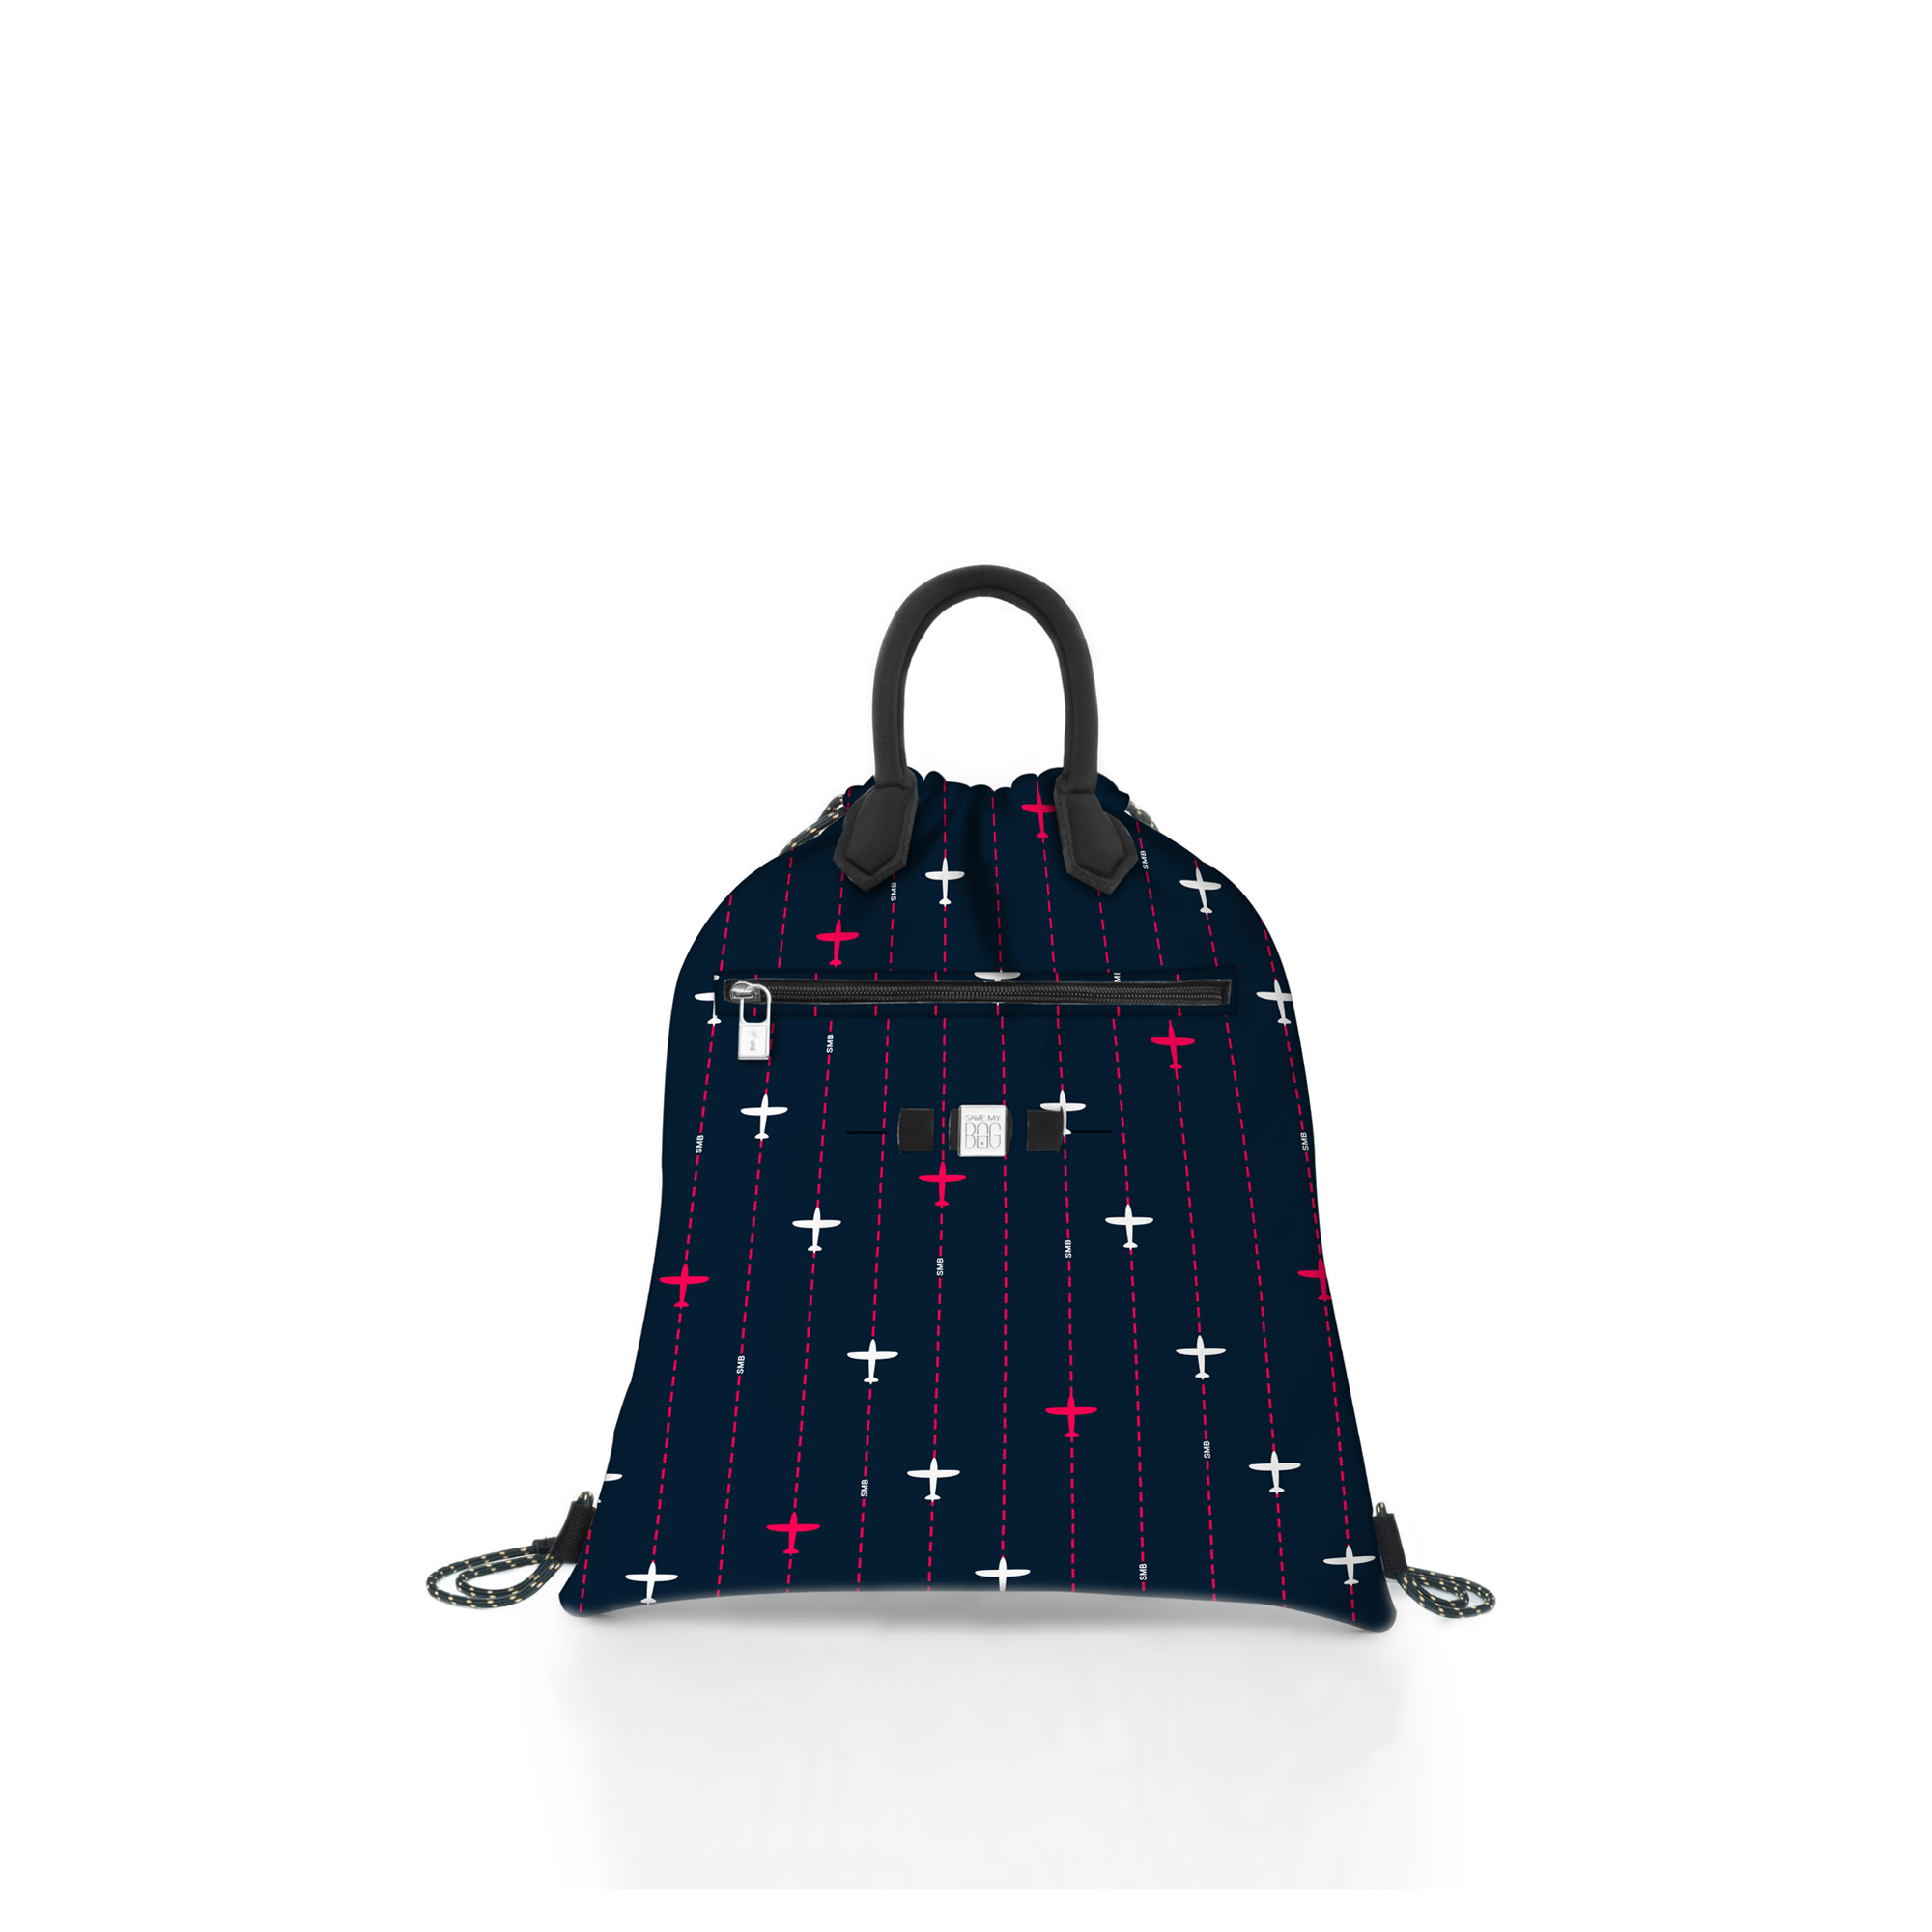 Save My Bag  a Milano Malpensa il nuovo temporary store  Foto ... 9f9d9ae6611